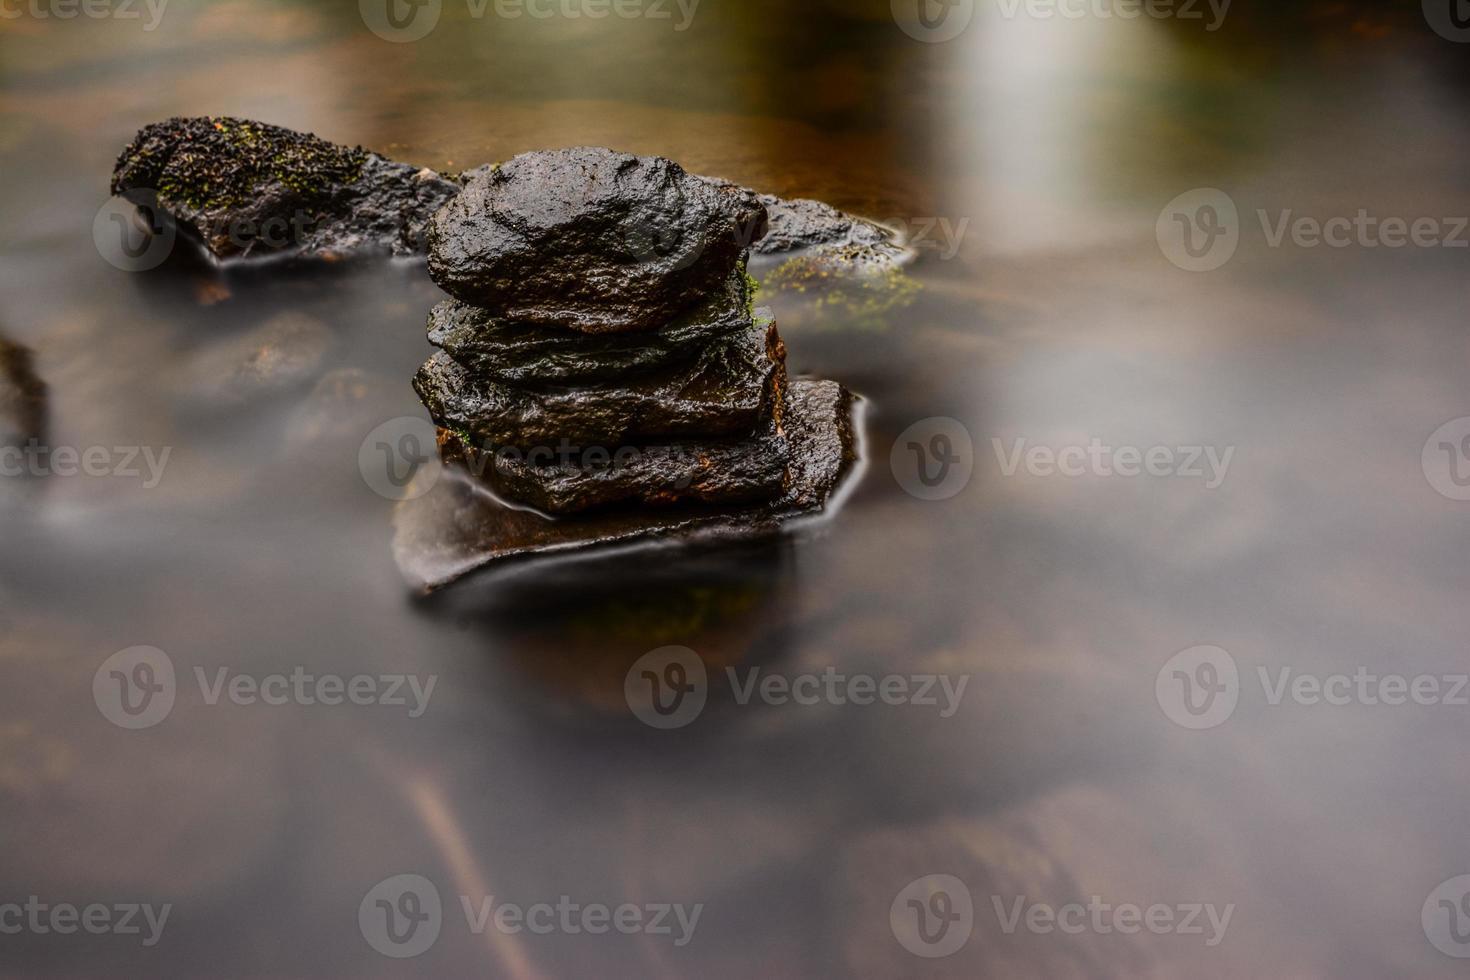 silkeslen vatten och sten foto